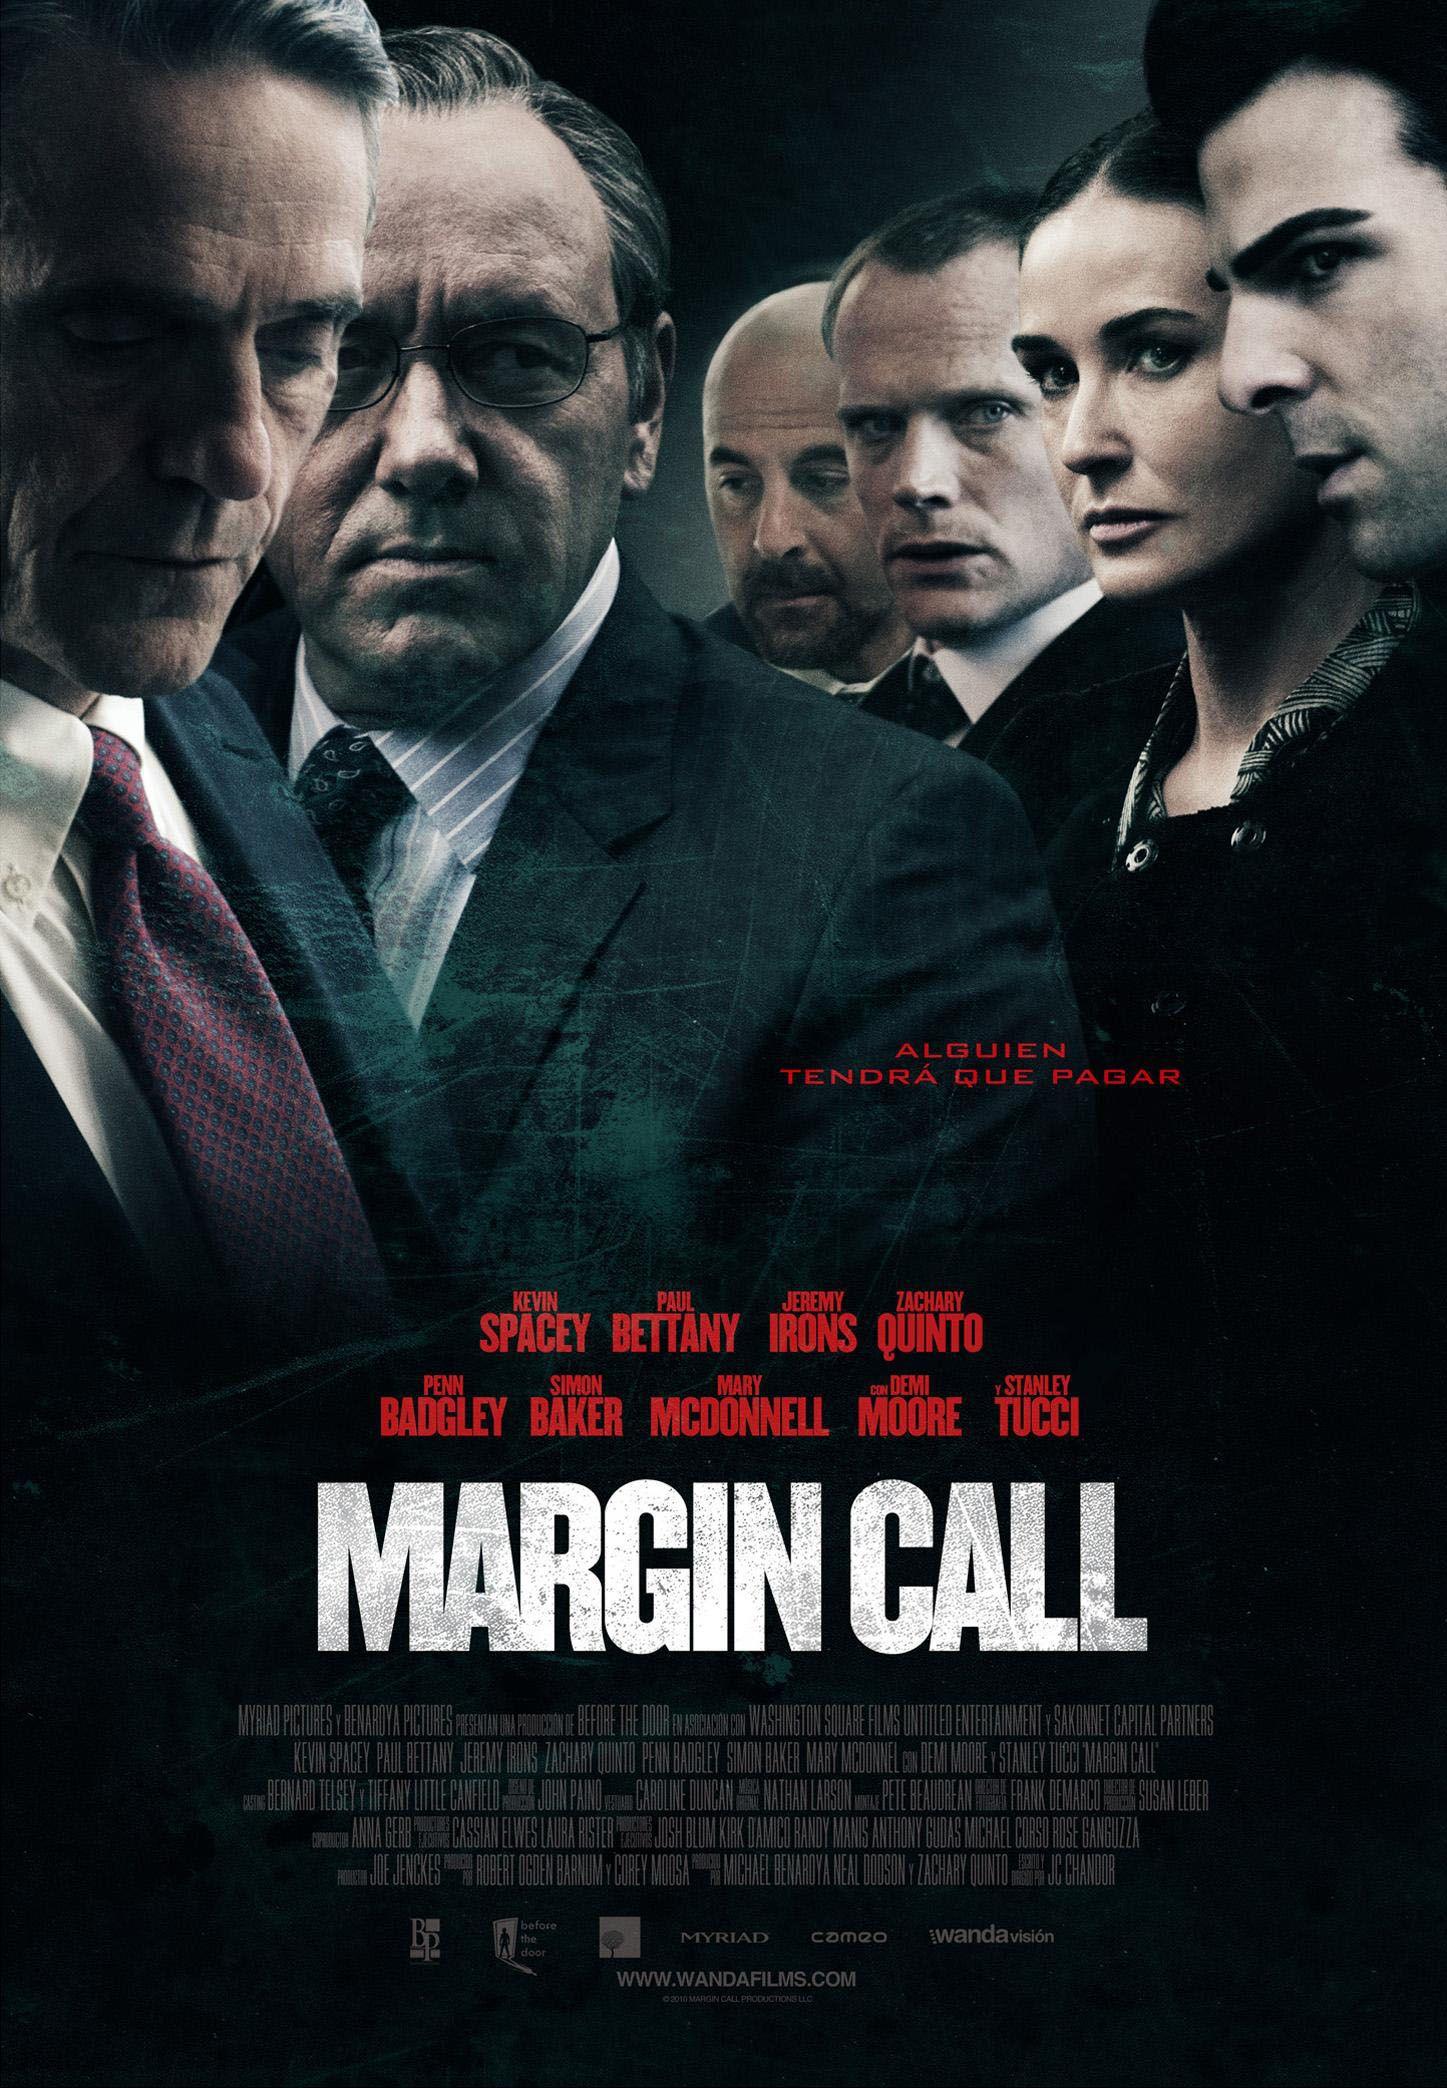 Margin call [Material gráfico] / Director, J.C. Chandor